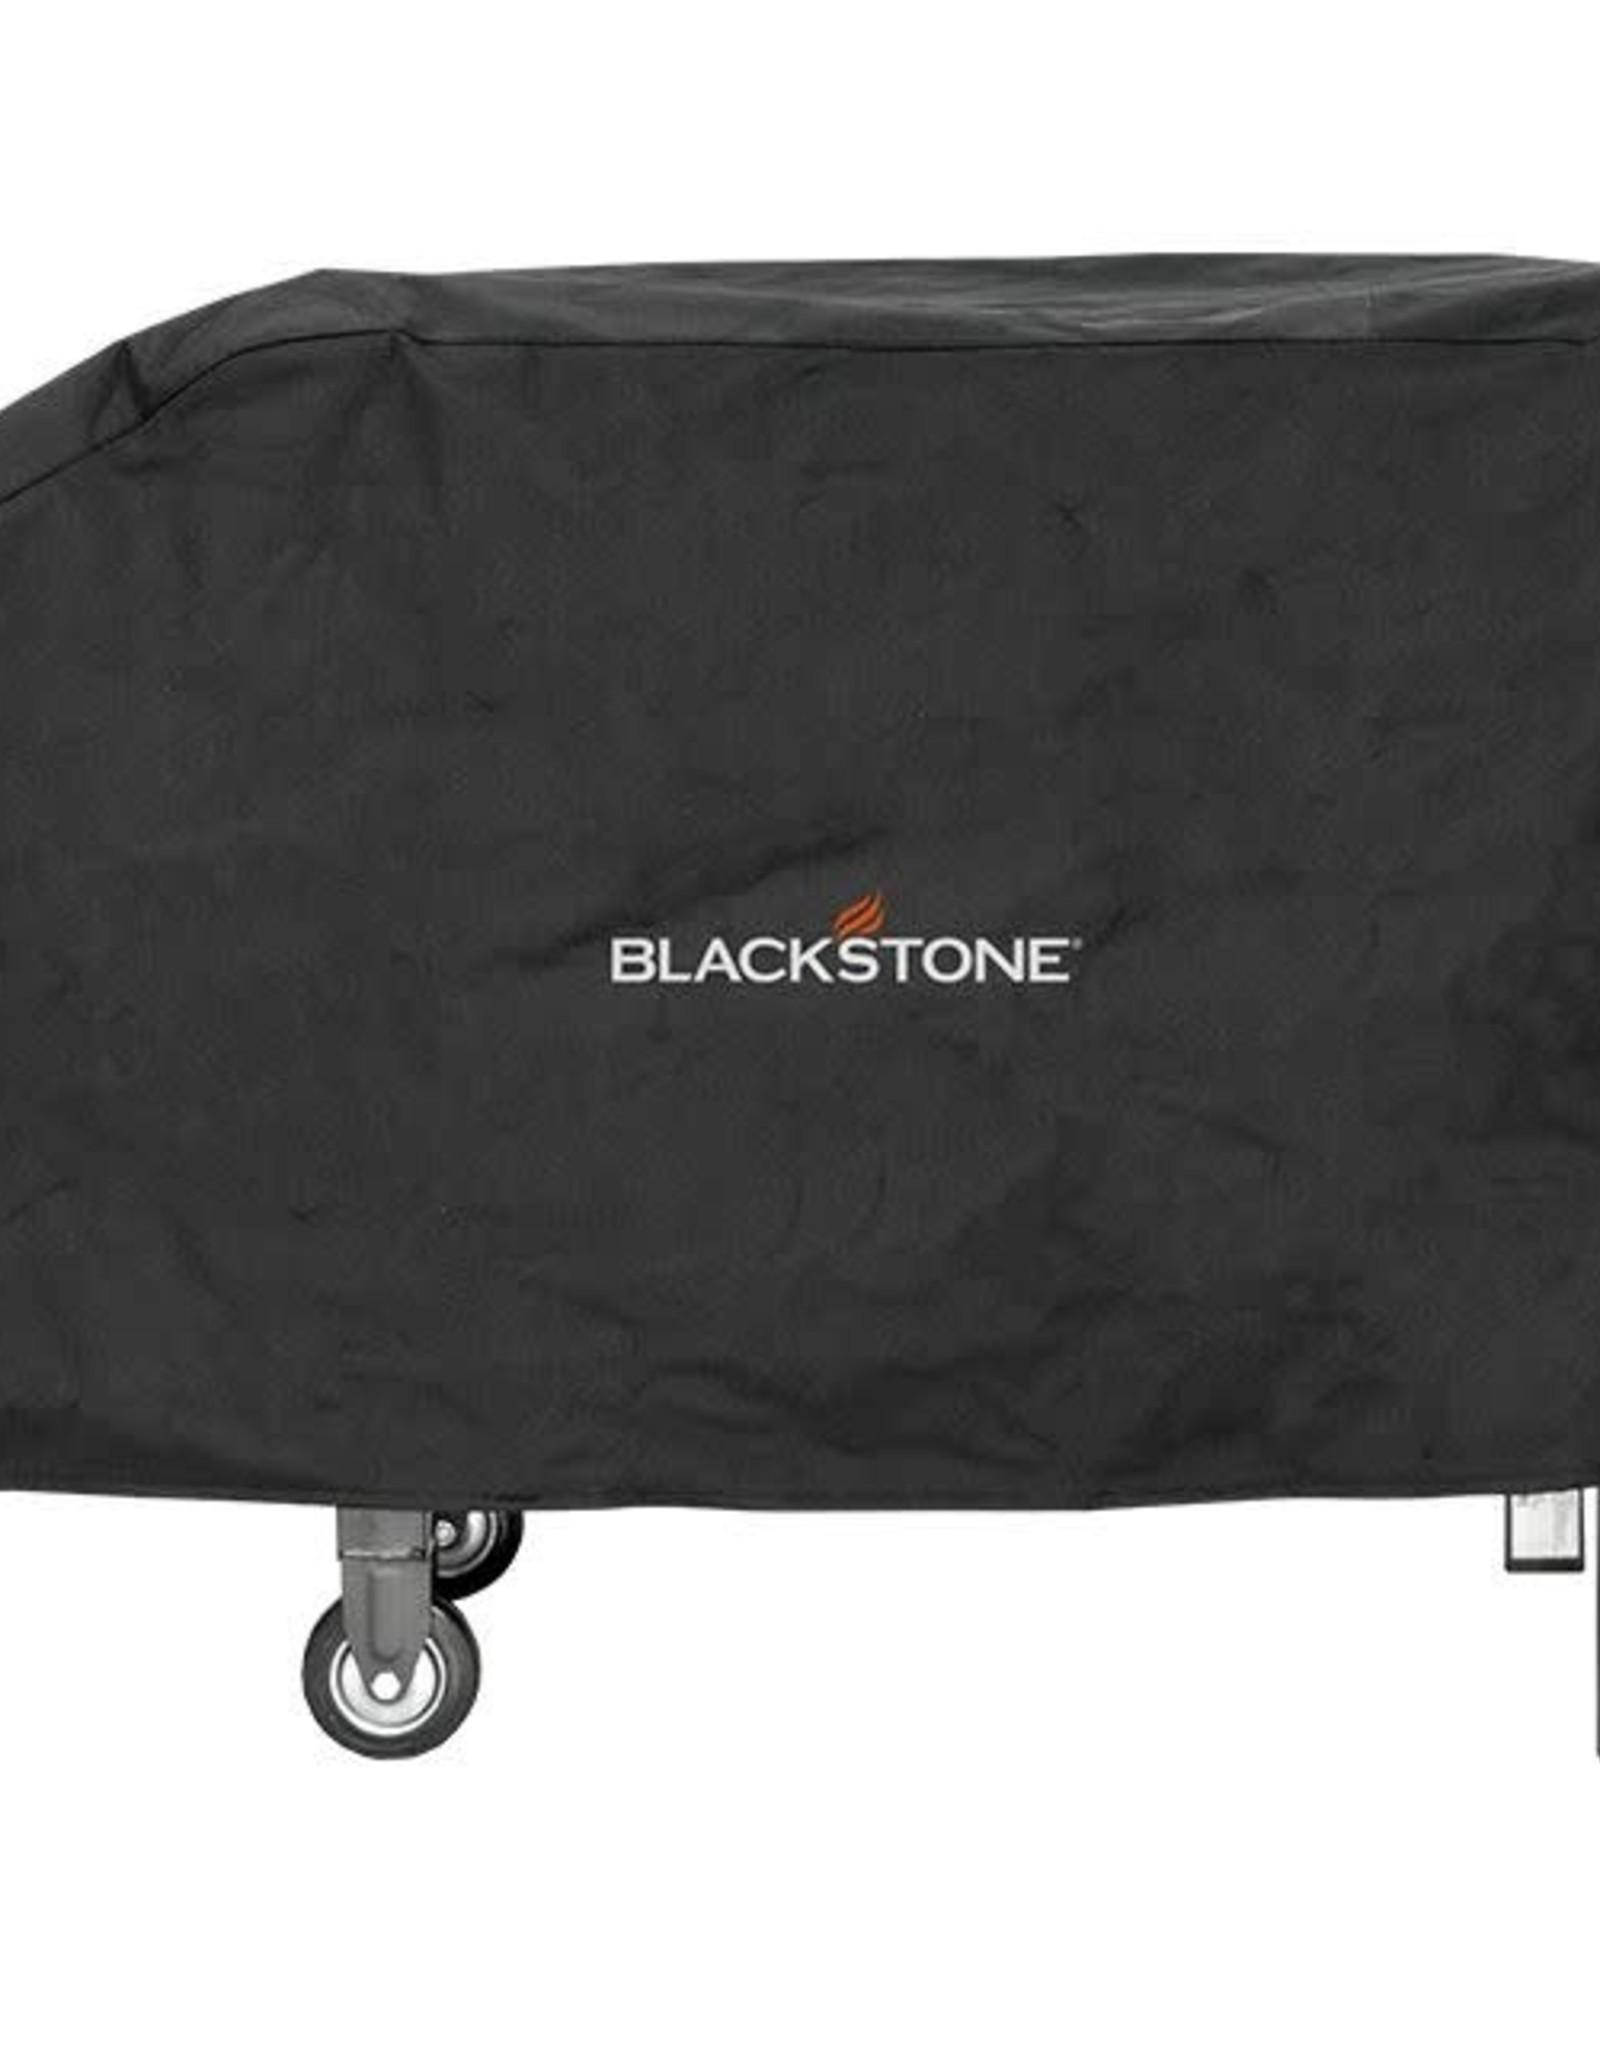 "Blackstone Blackstone 28"" Griddle Soft Cover 1529"